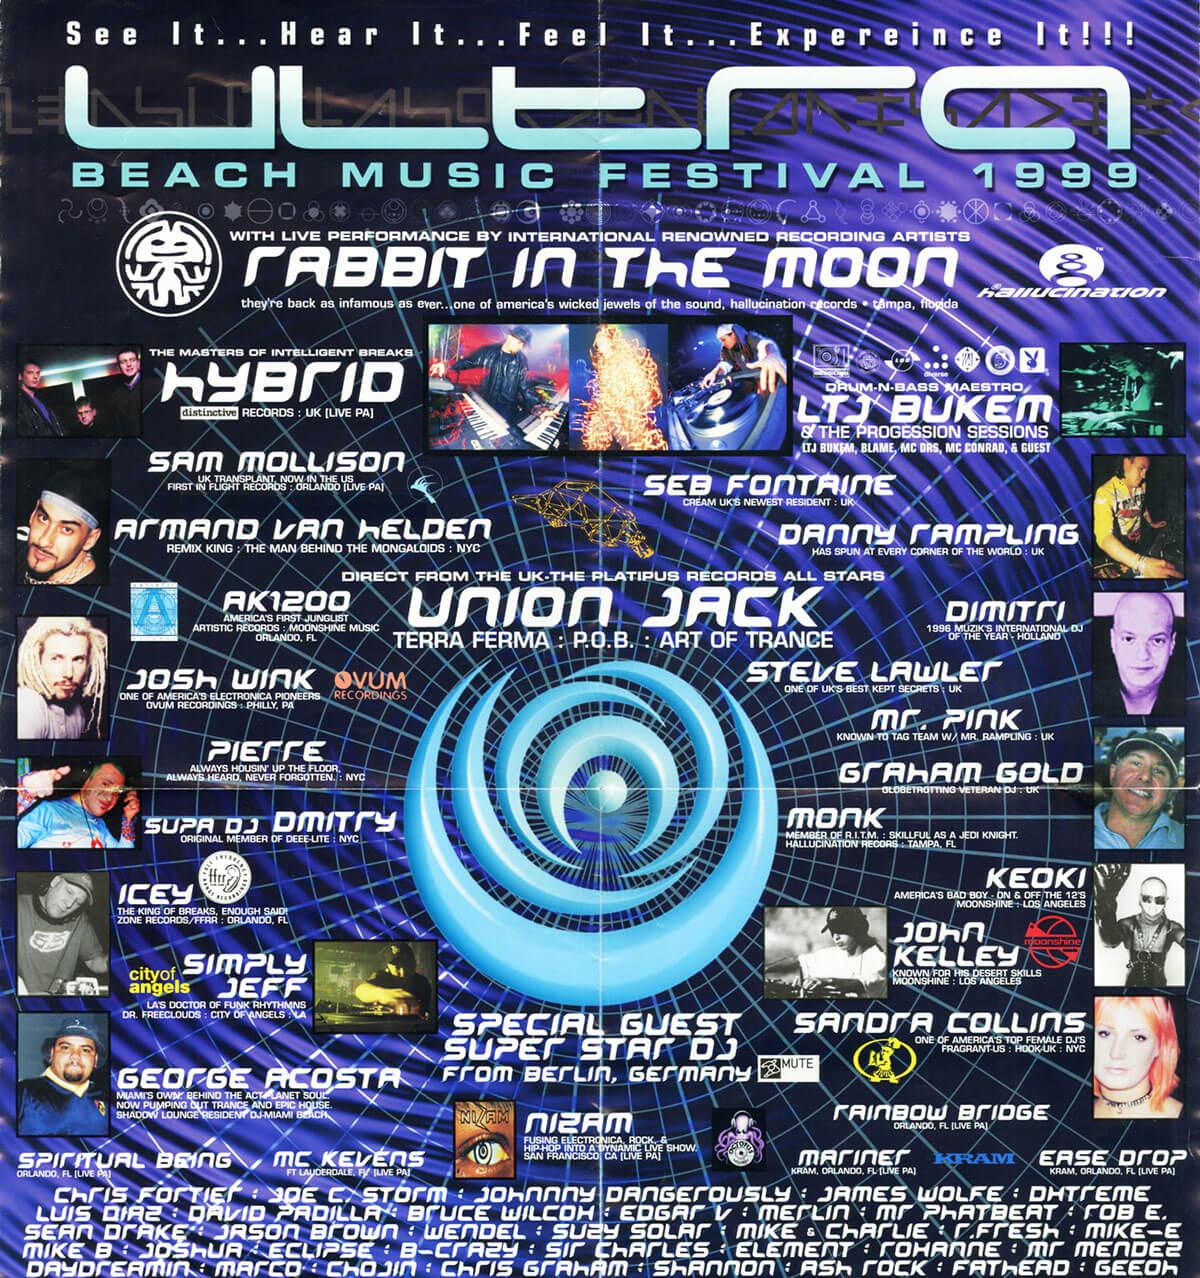 Previous Lineups Ultra Music Festival